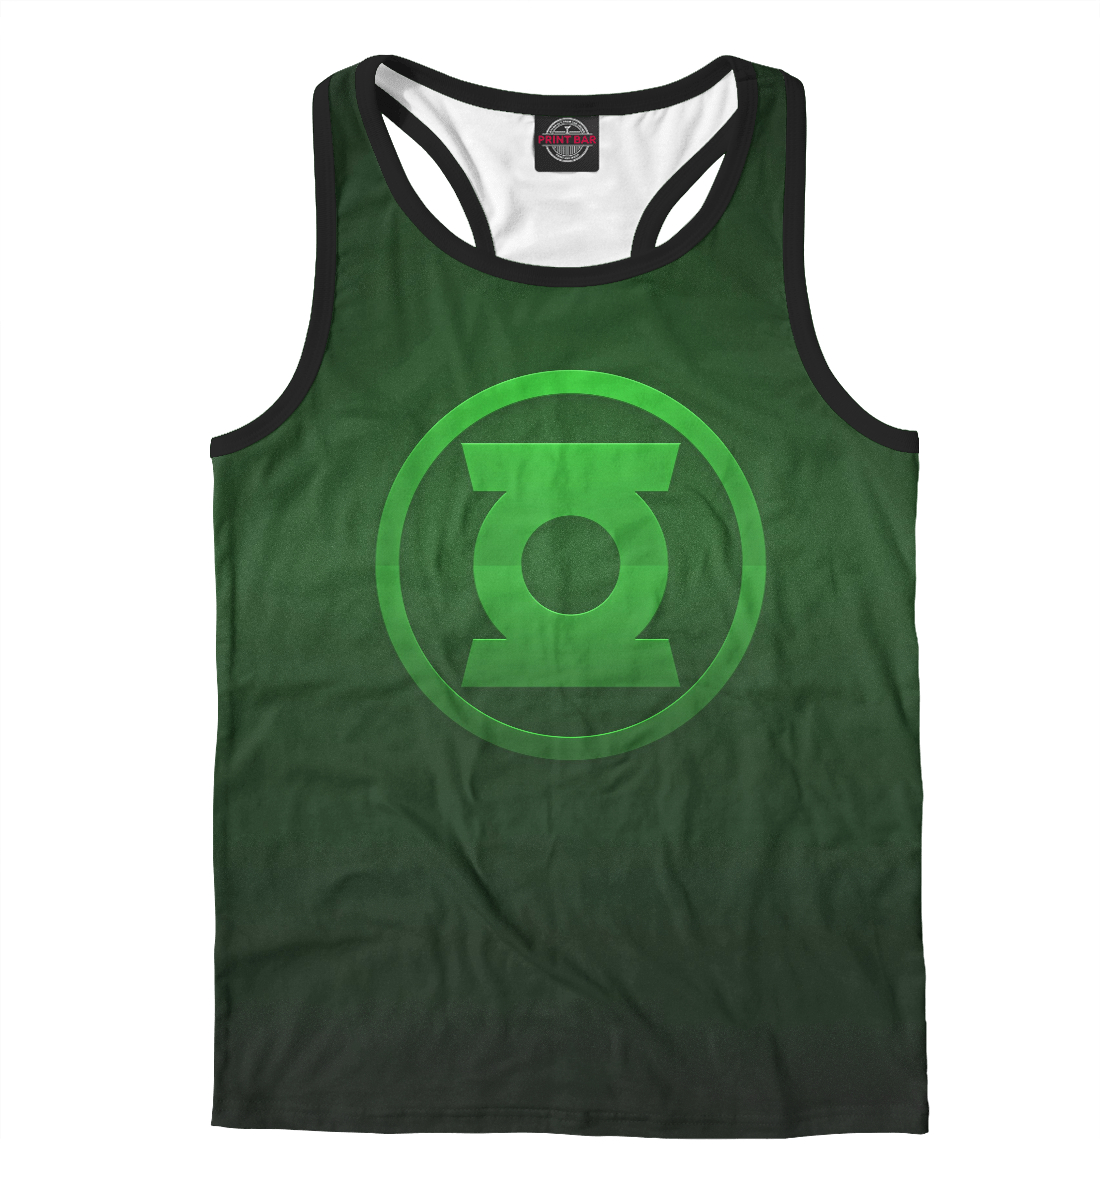 Купить Зеленый Фонарь, Printbar, Майки борцовки, KNO-584866-mayb-2